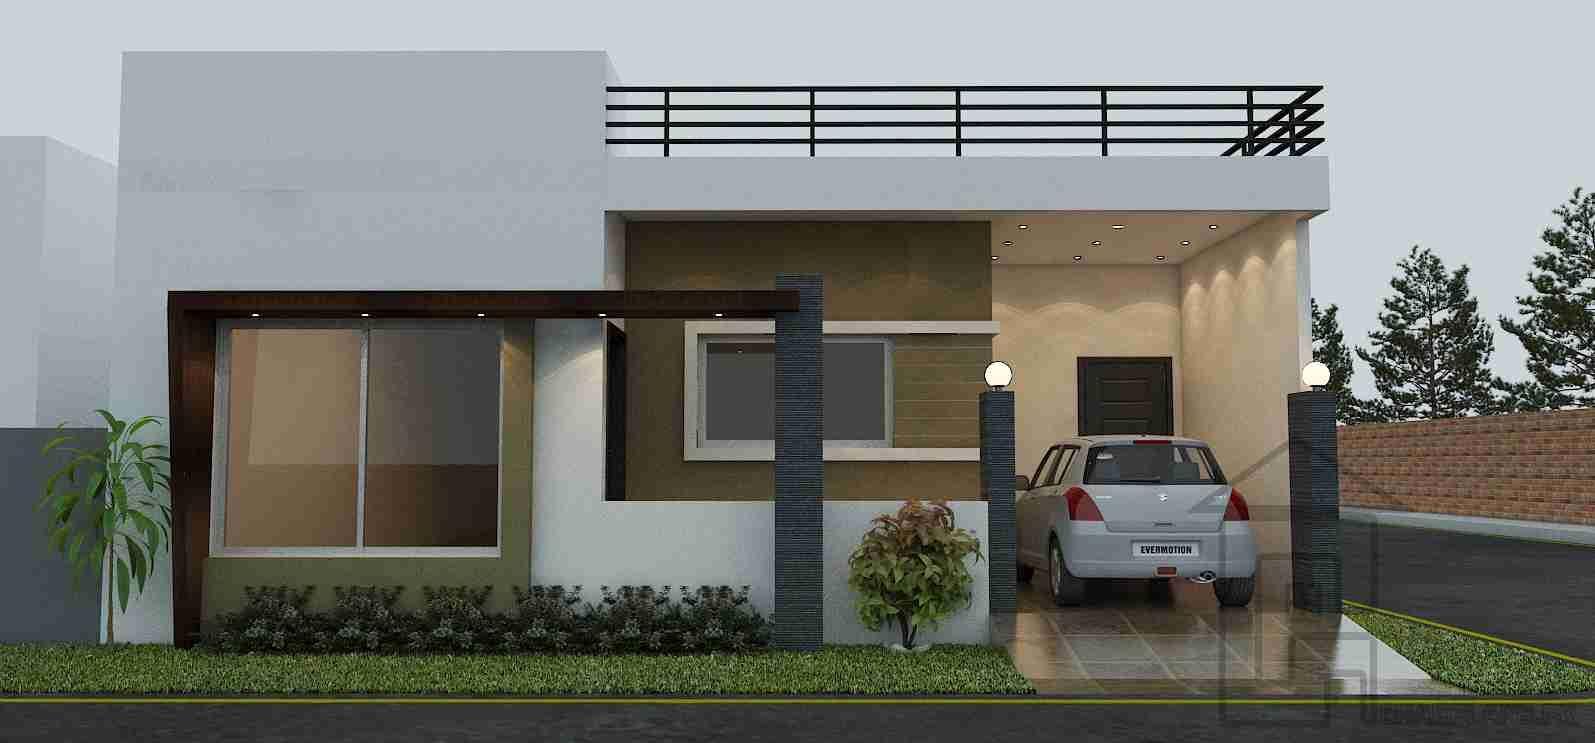 Single storey house design front elevation. Single storey house design front elevation   House Elevation